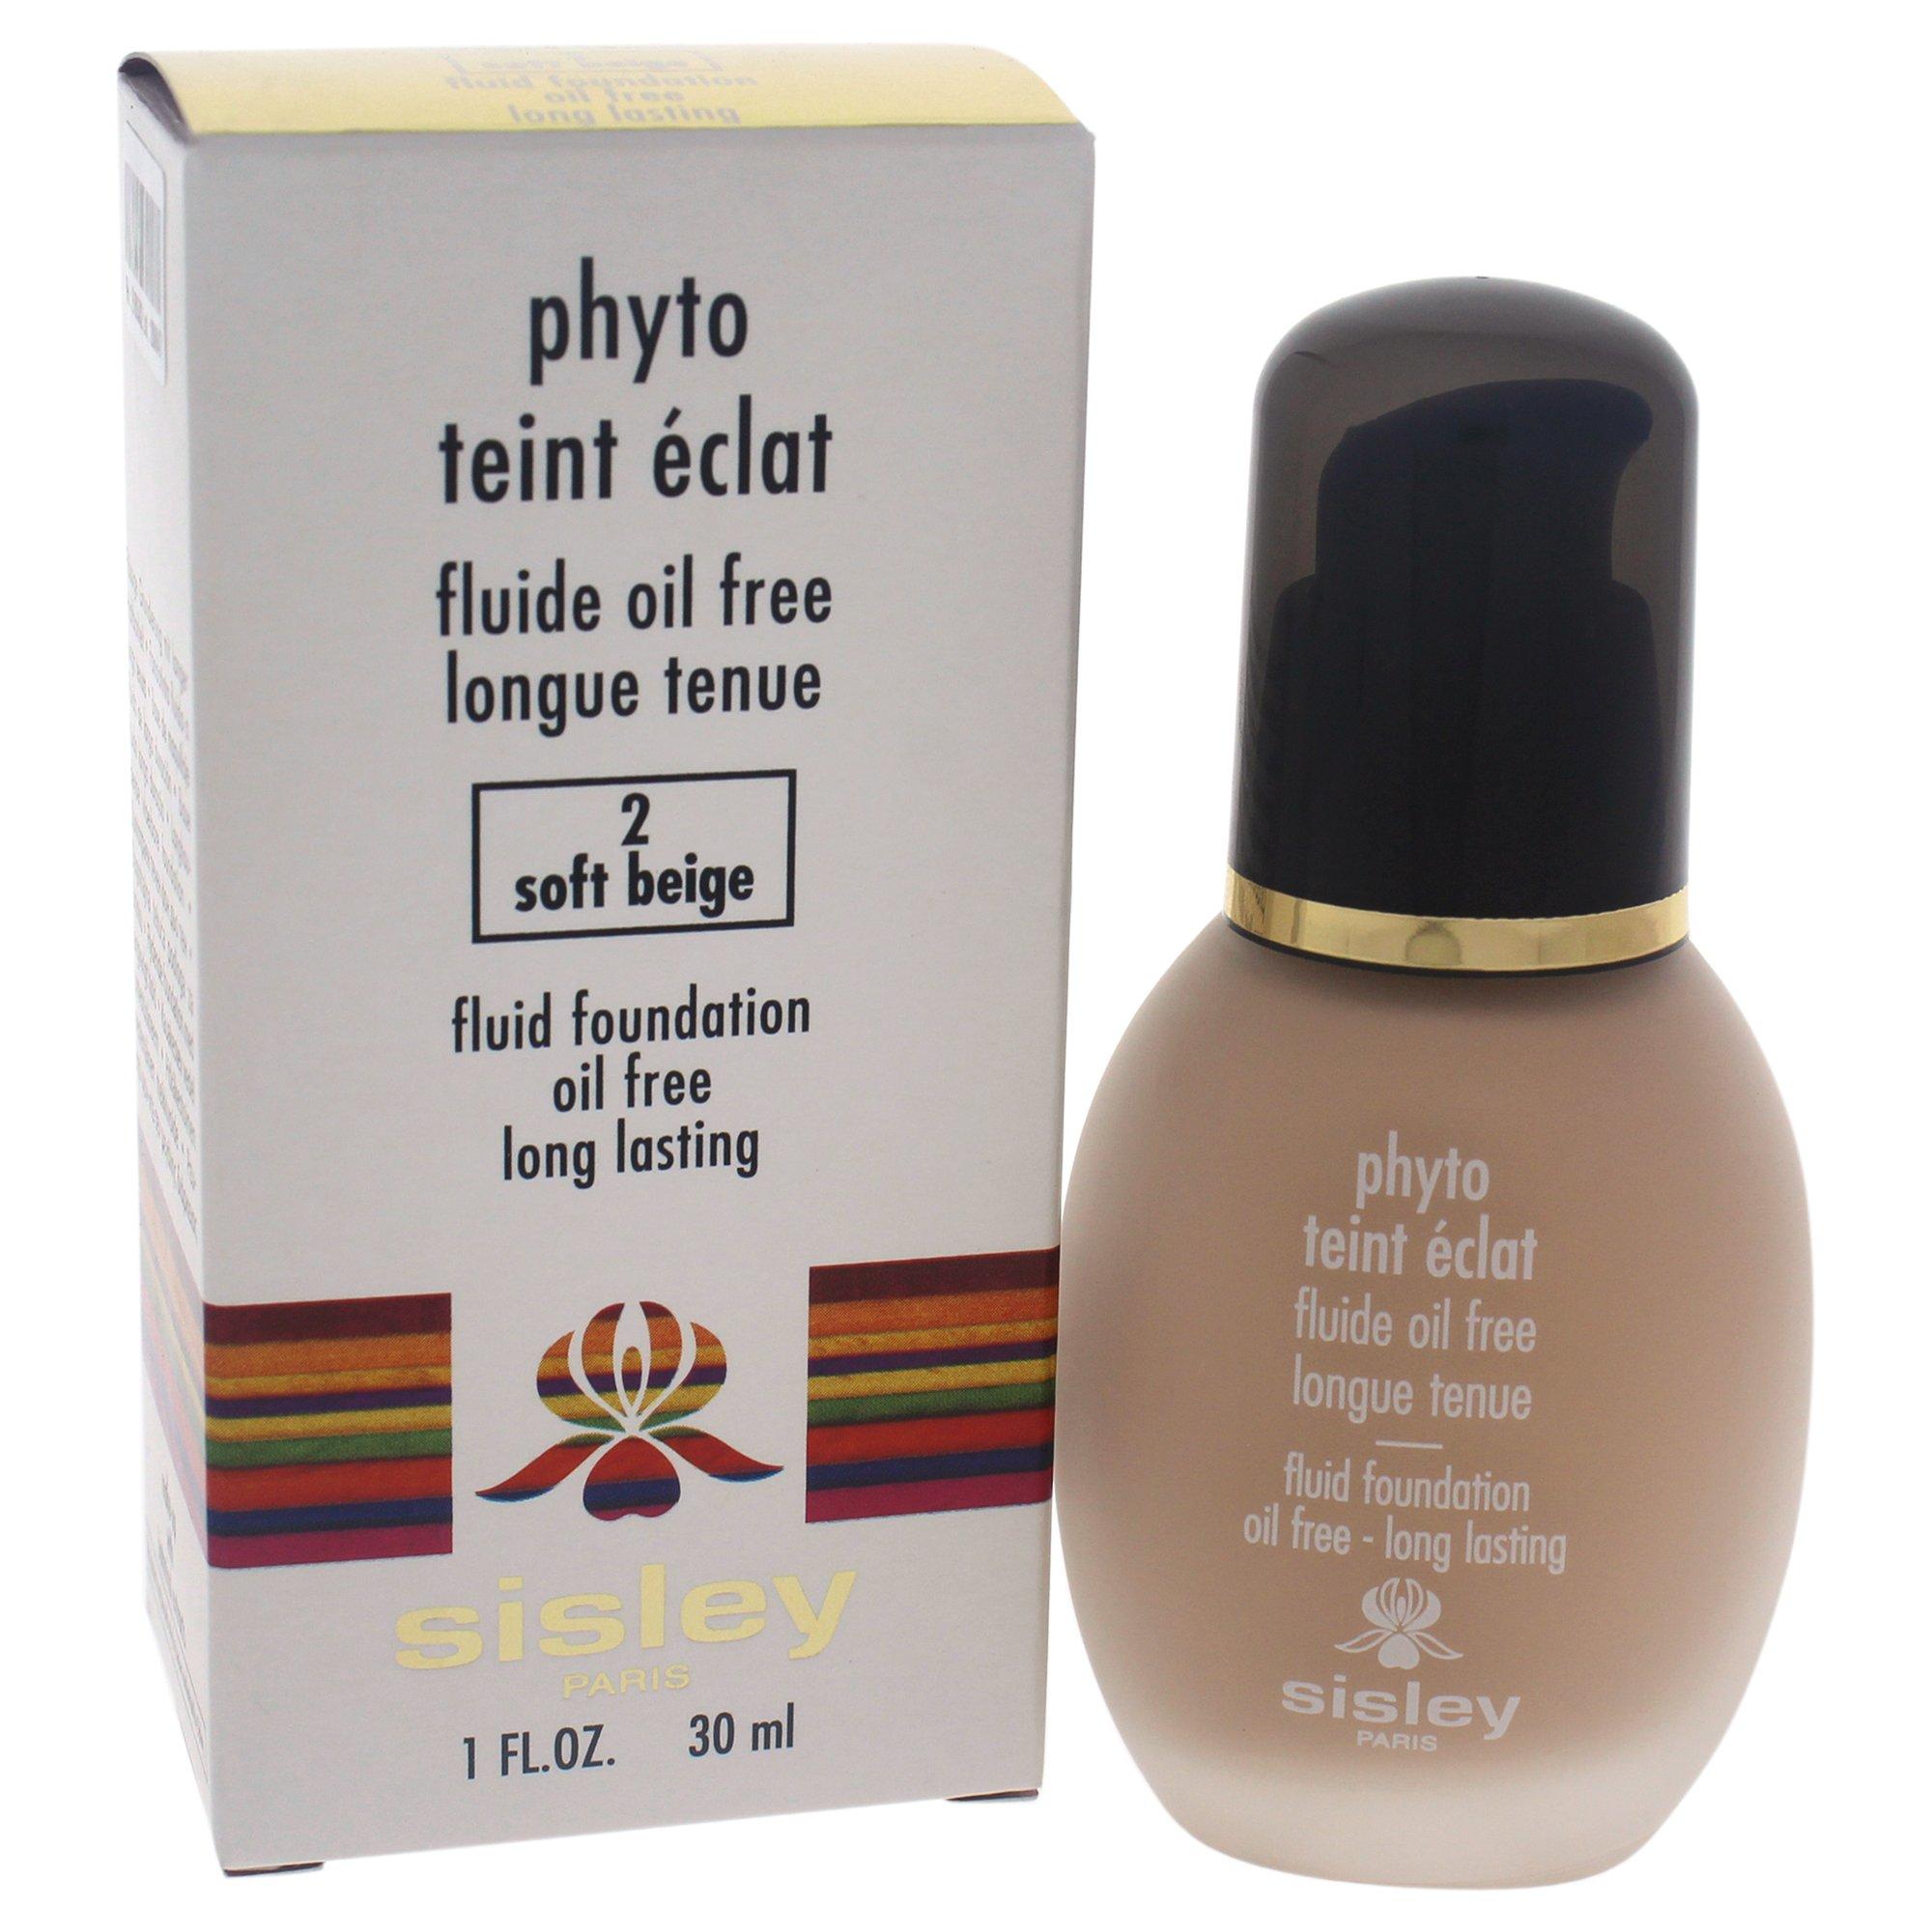 Sisley Oil Free Fluid Foundation, 2 Soft Beige, Phyto, 1 Ounce